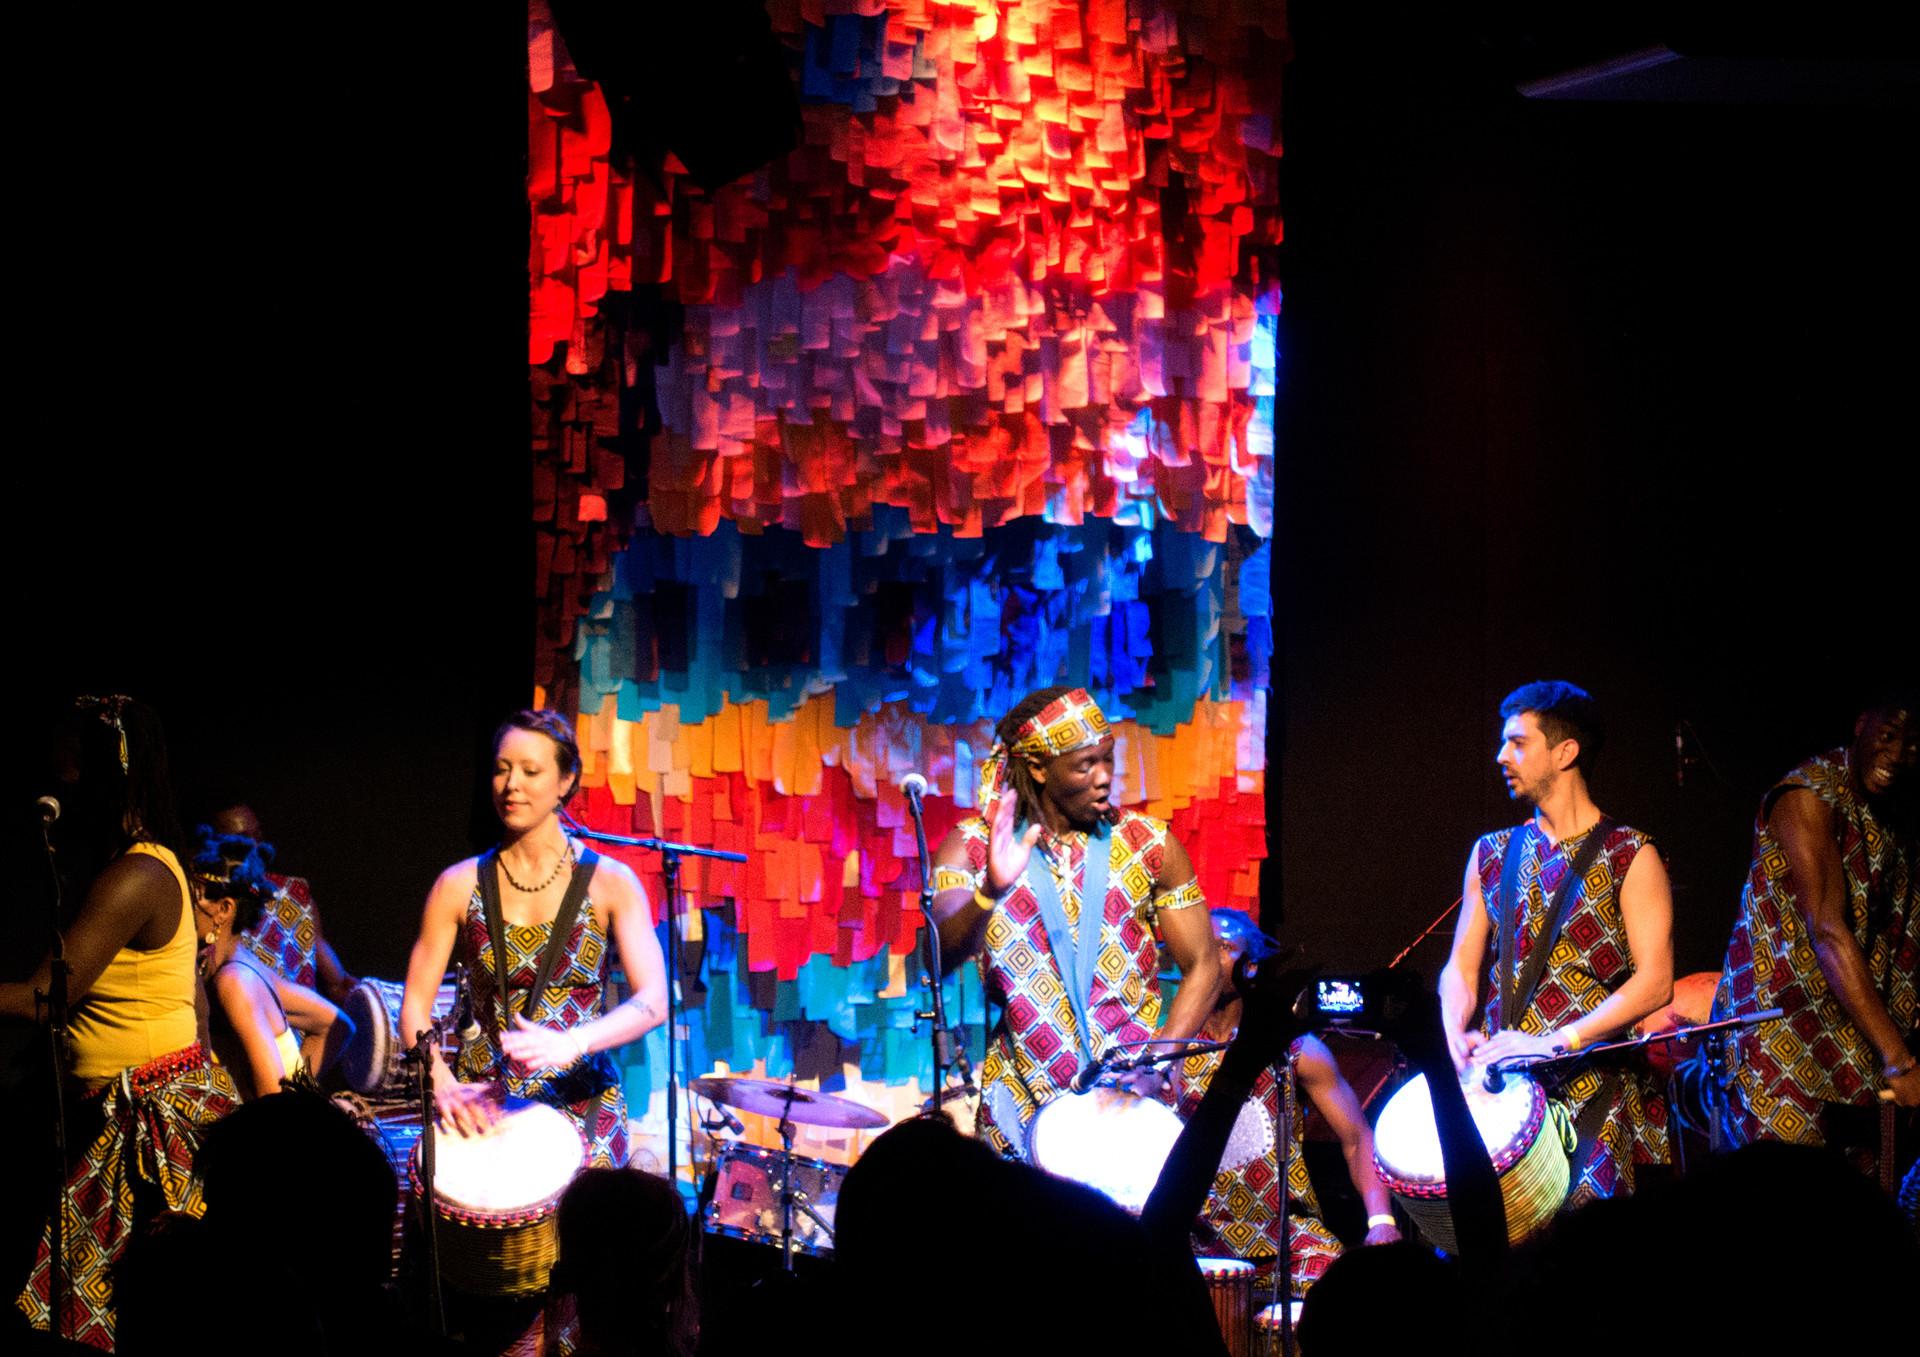 Diabel Cissokho, 'Tambacounda Express', album launch, Richmix Cultural Foundation, June 2016